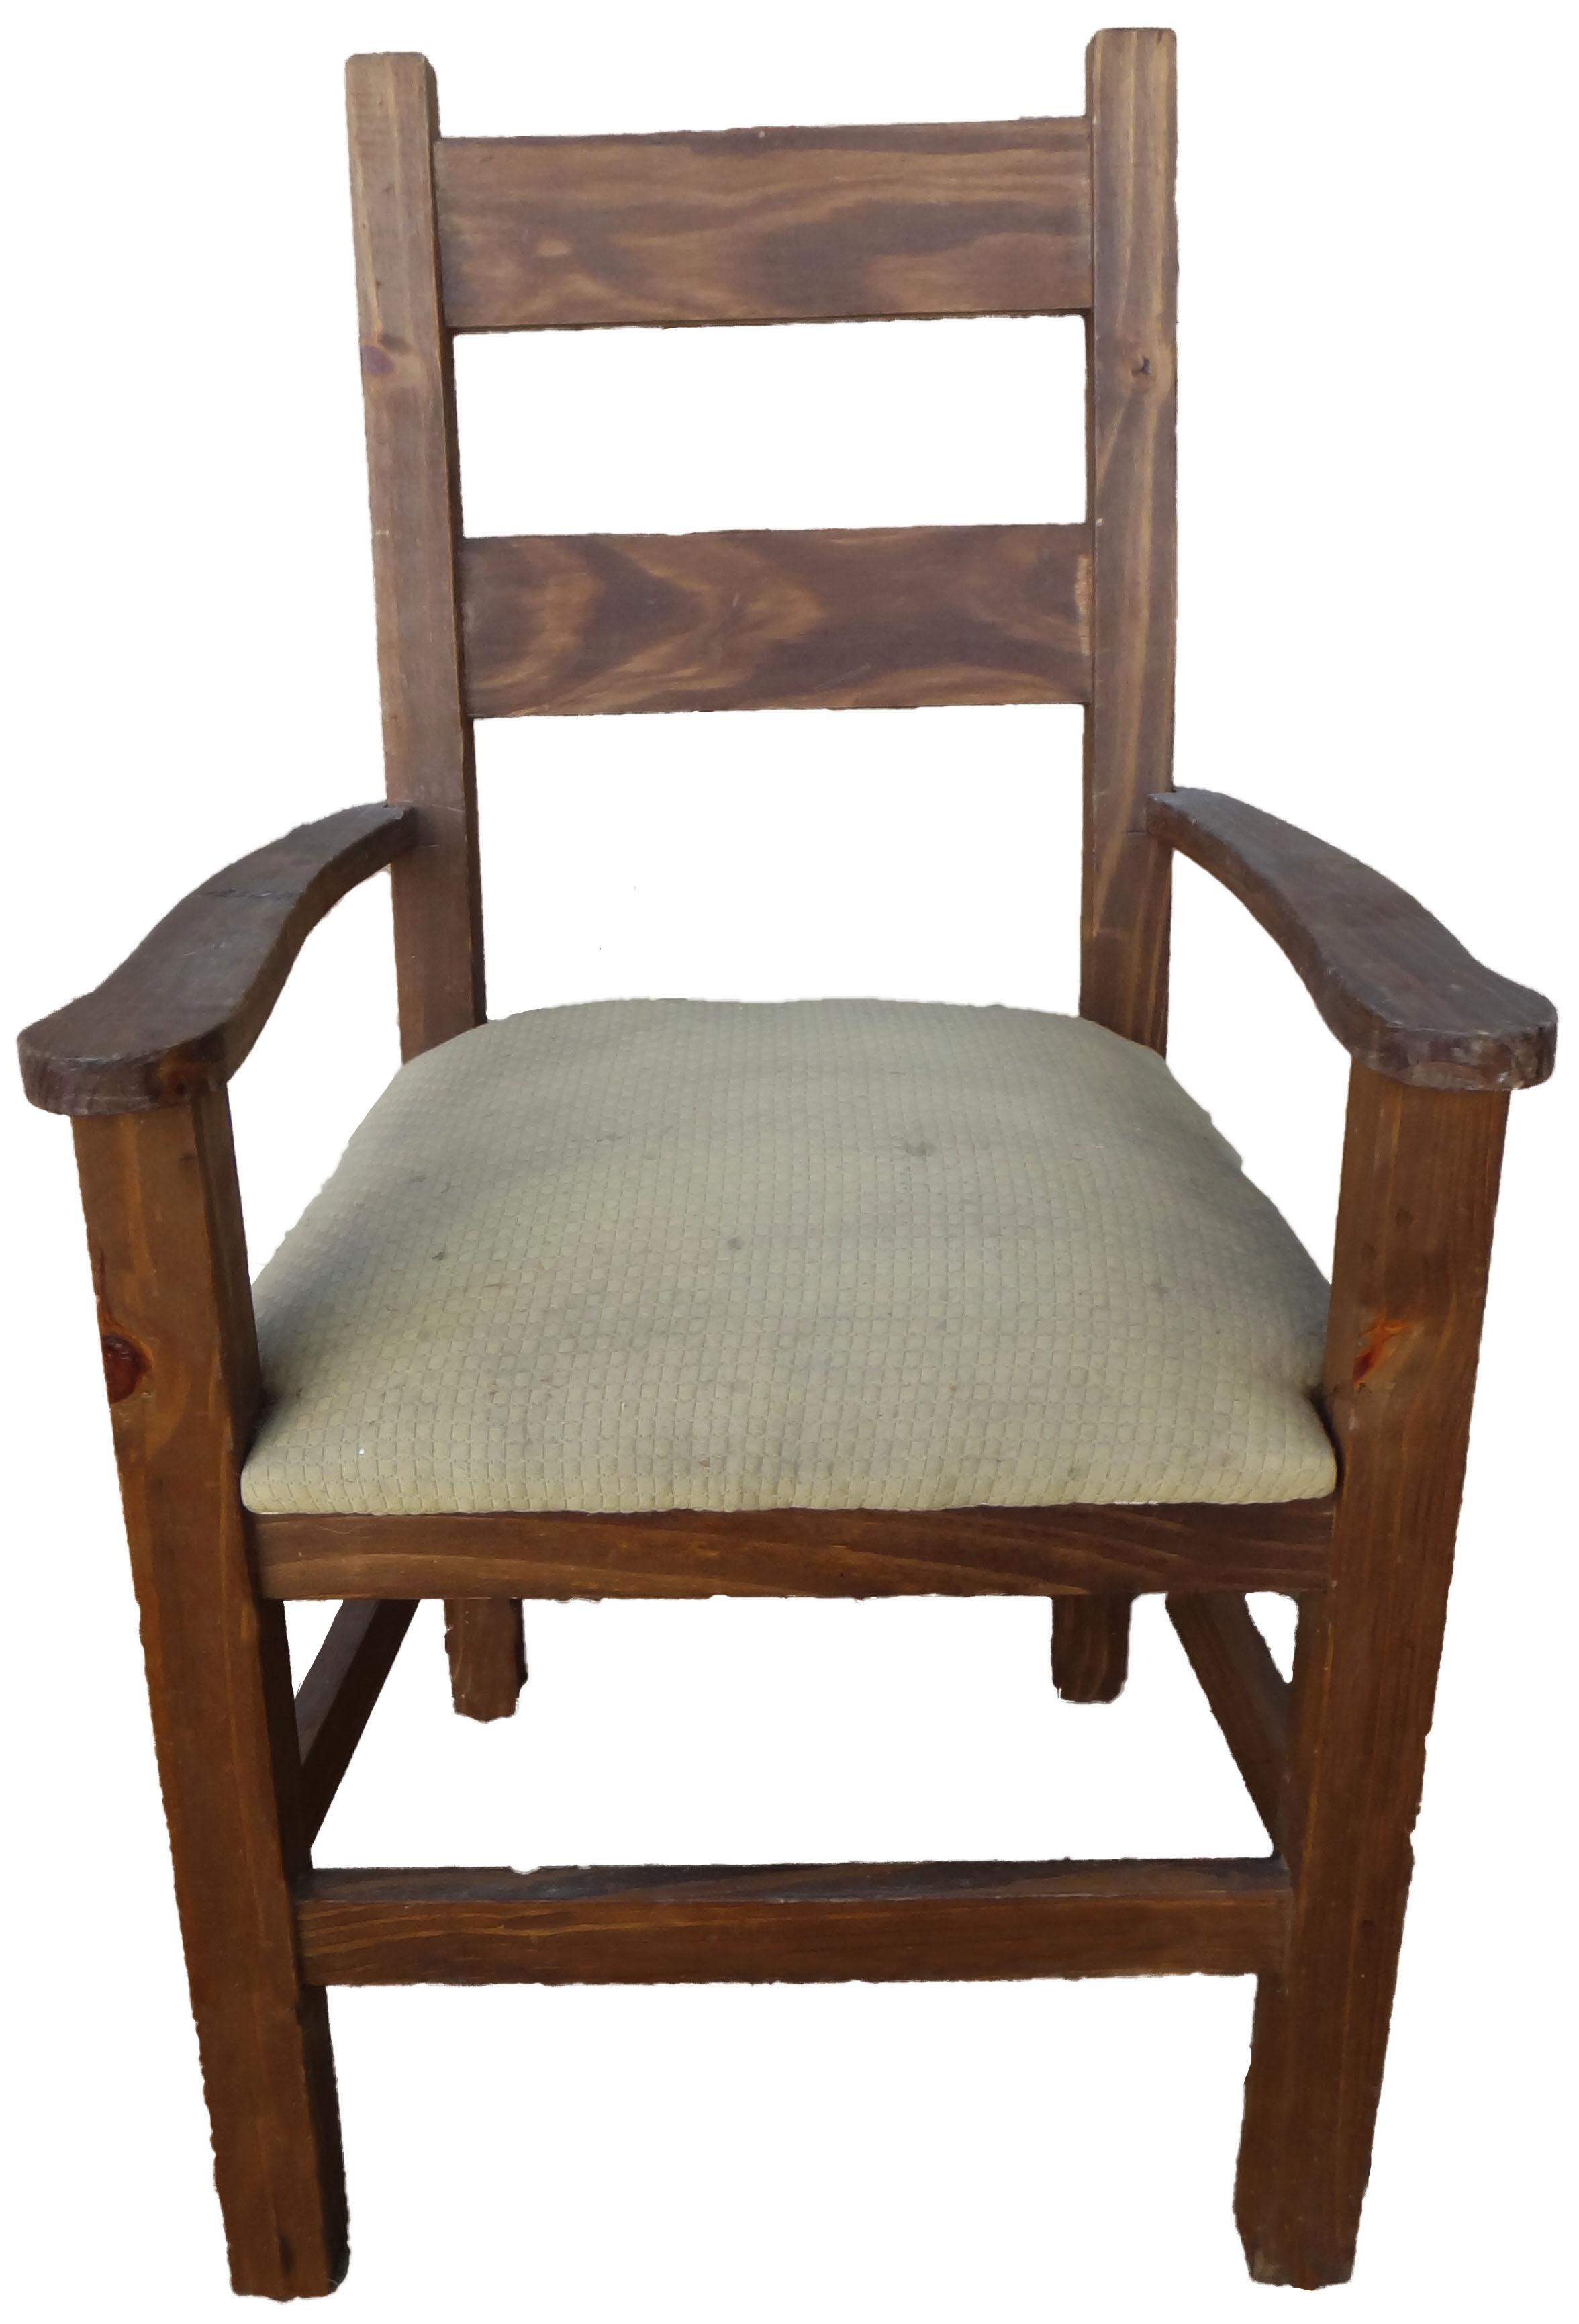 Sillones estilo antiguo carpinteria restauracion - Sillones de madera antiguos ...